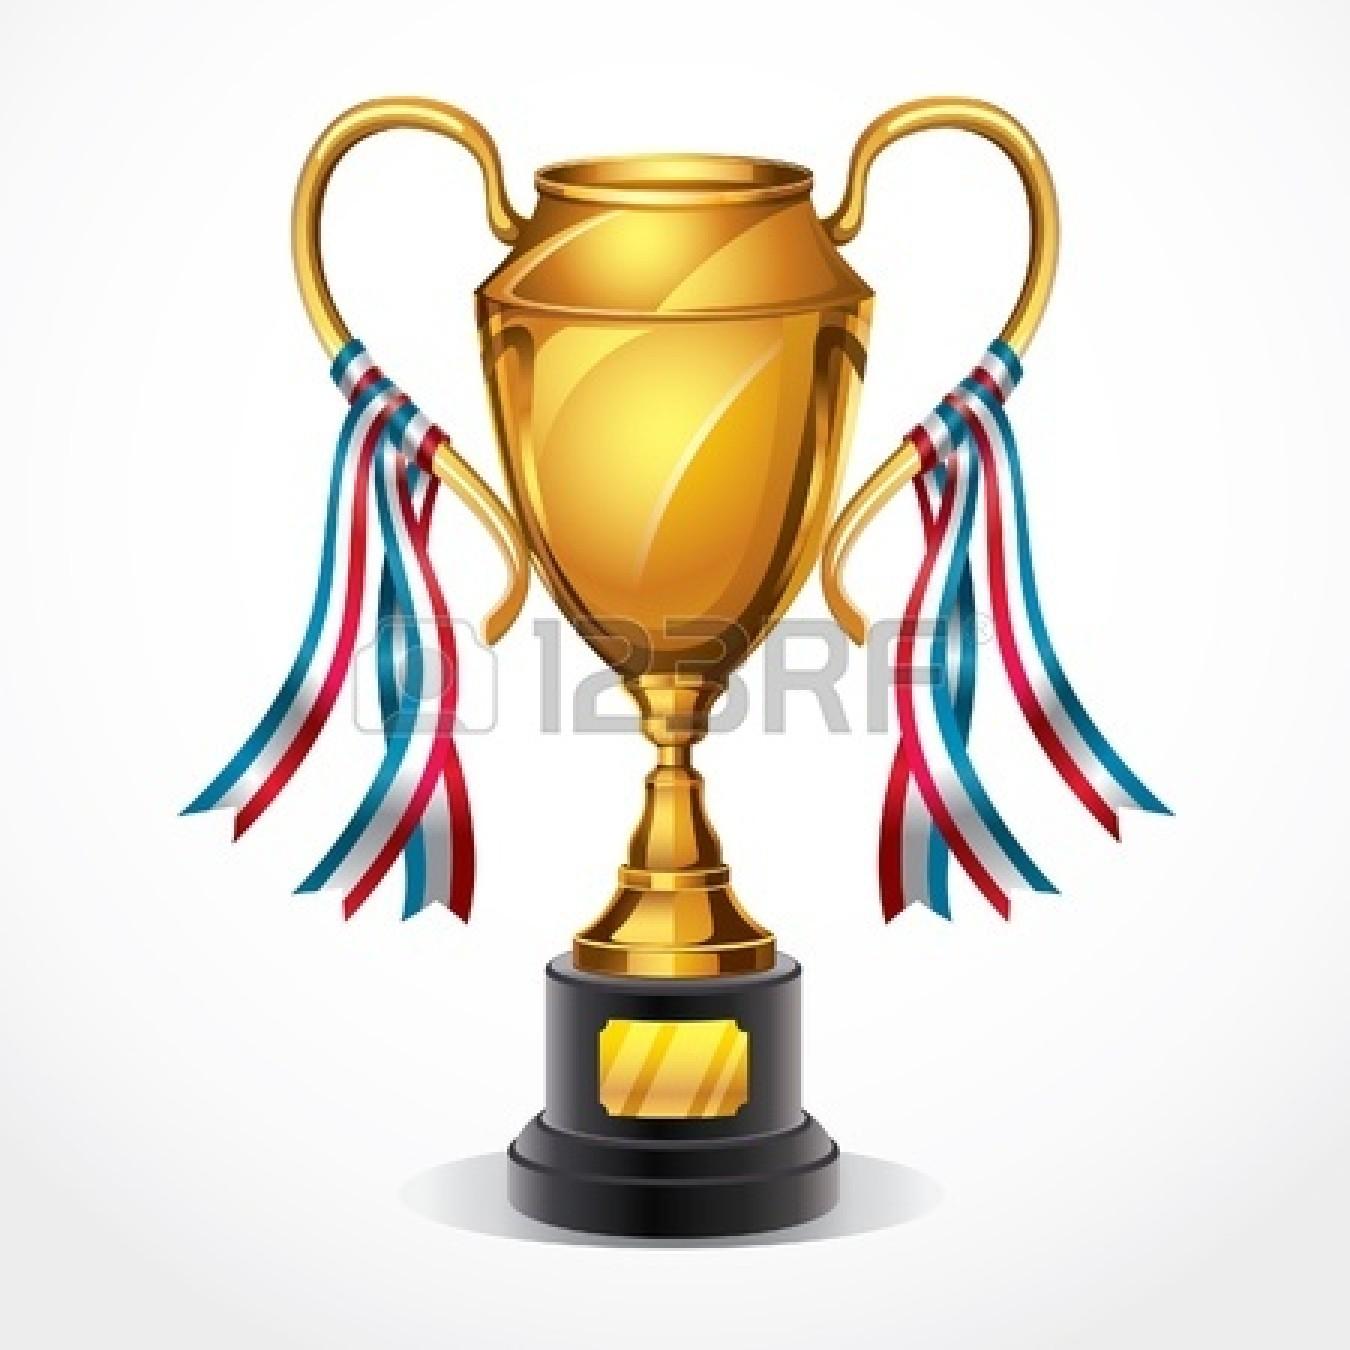 1350x1350 Trophy Clipart Championship Trophy